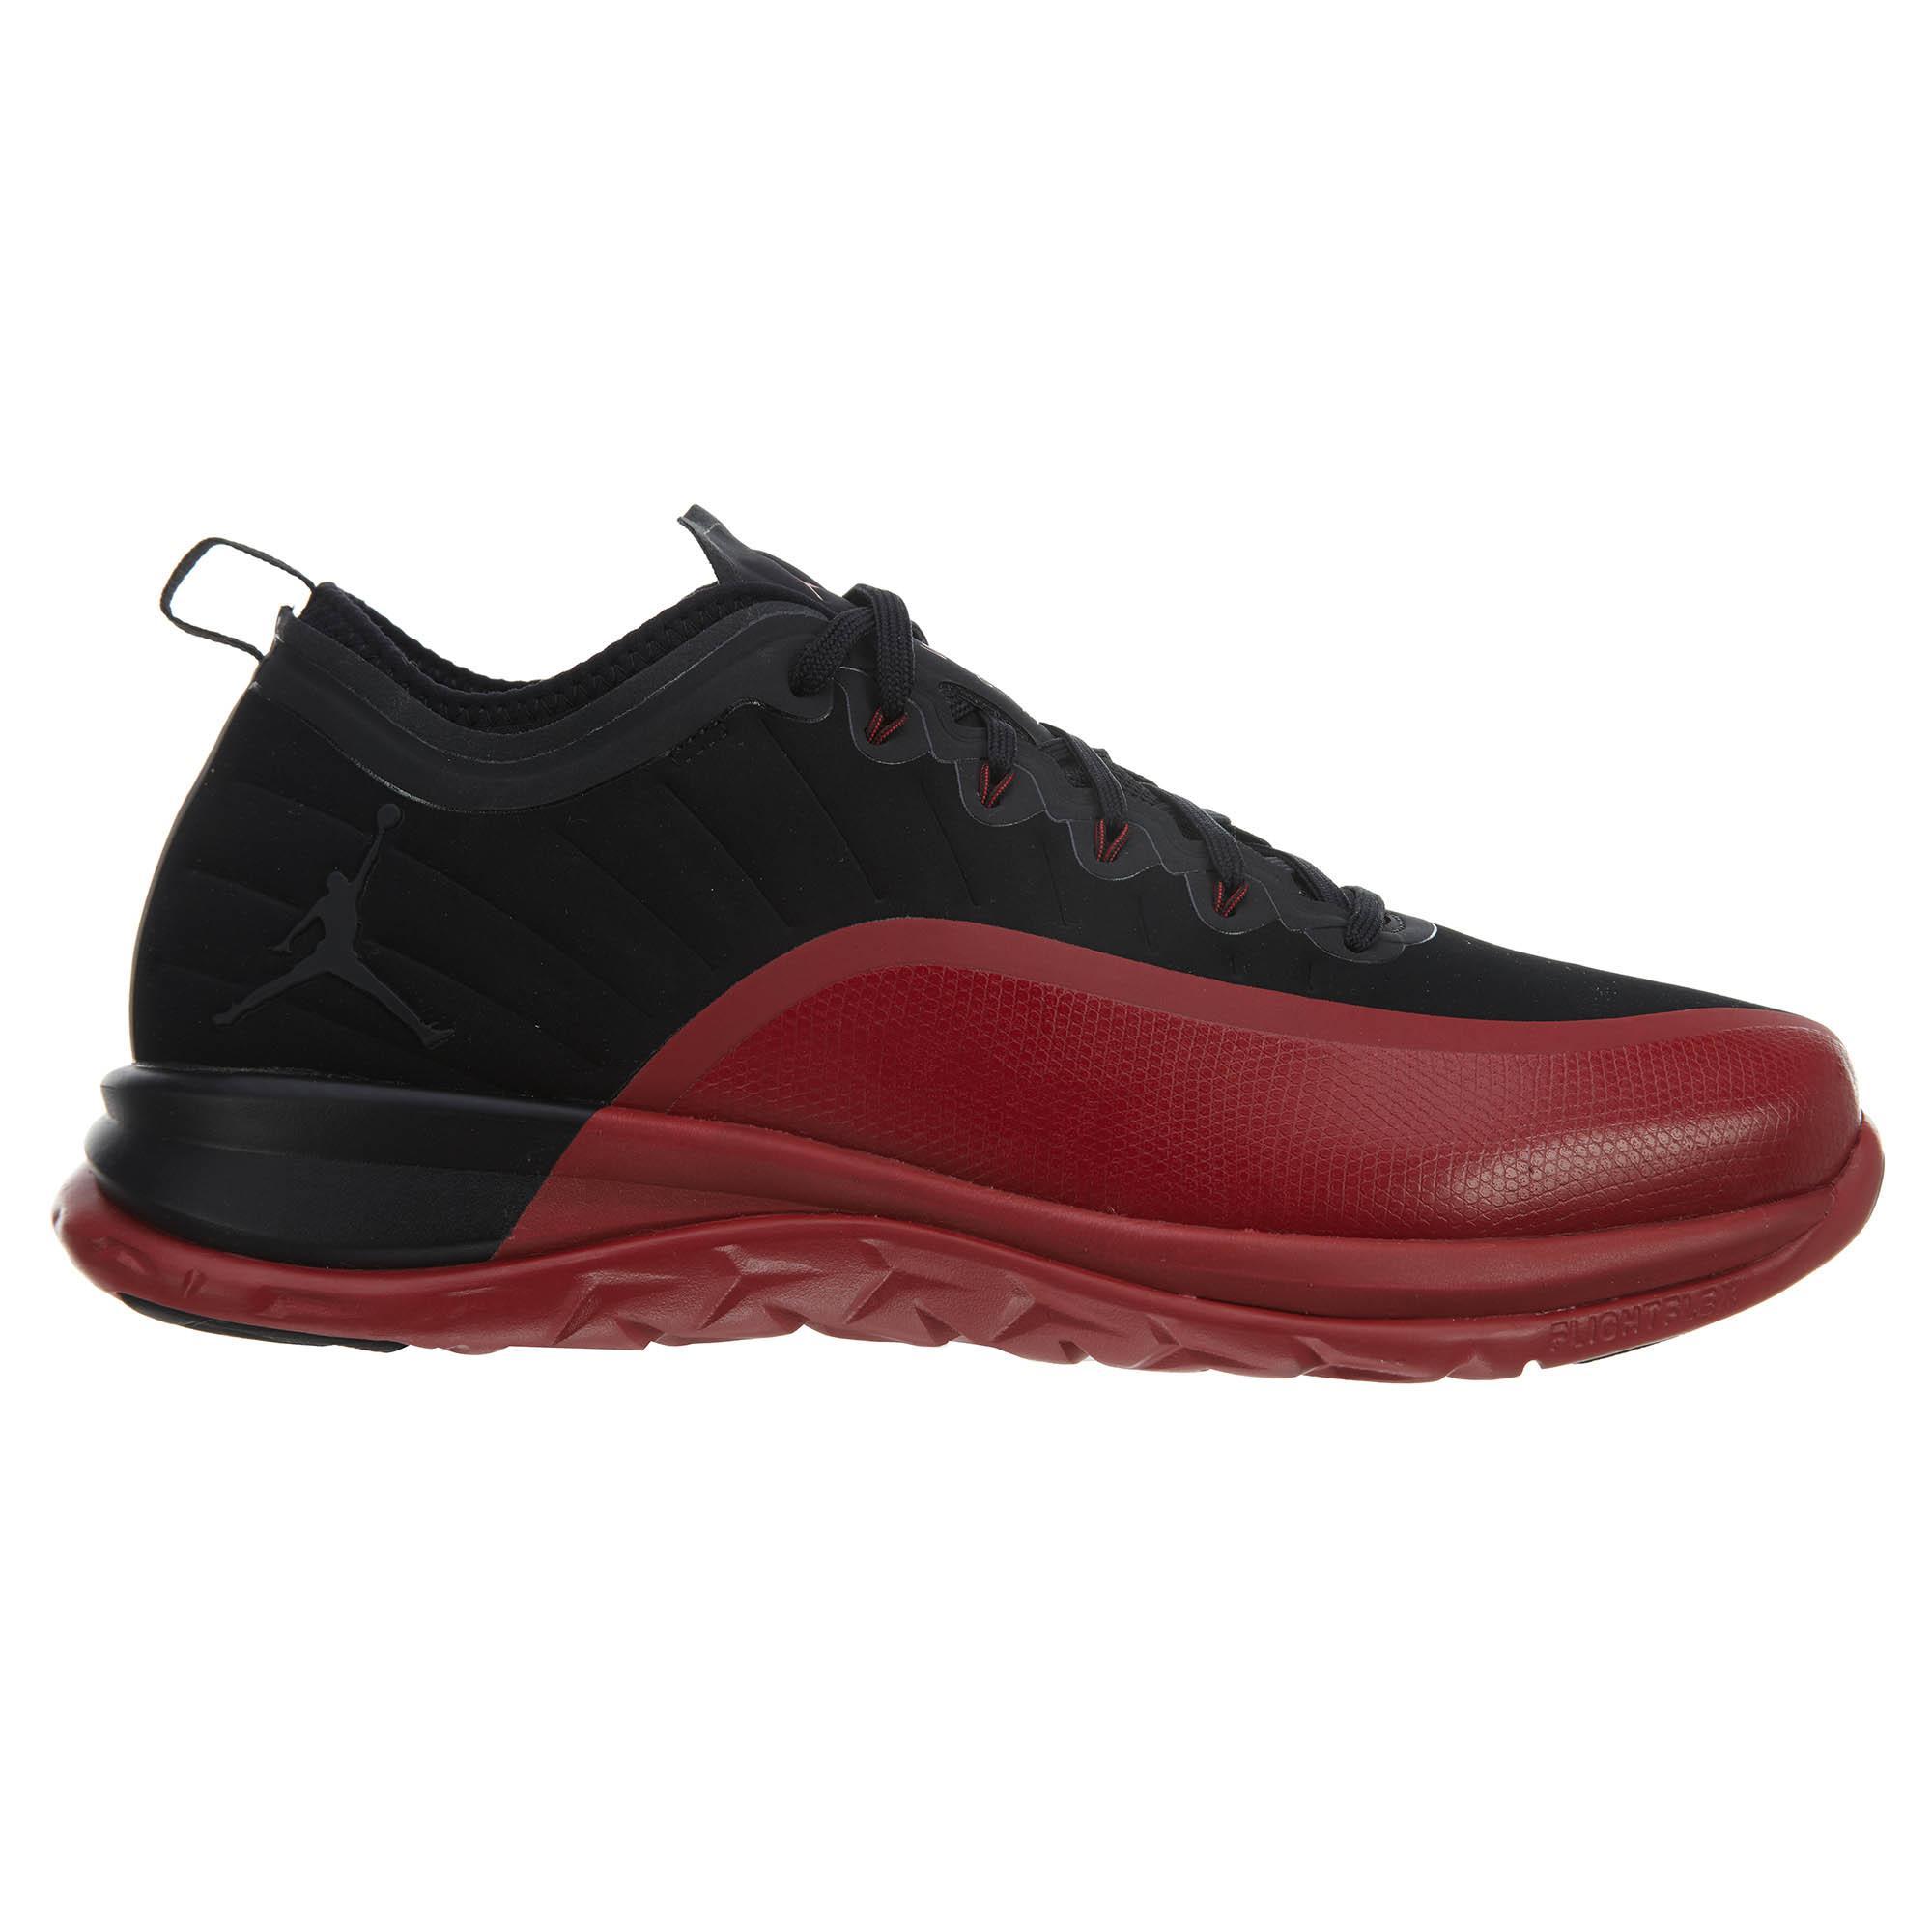 c1b64c65 Lyst - Nike Trainer Prime Black/black-gym Red in Black for Men